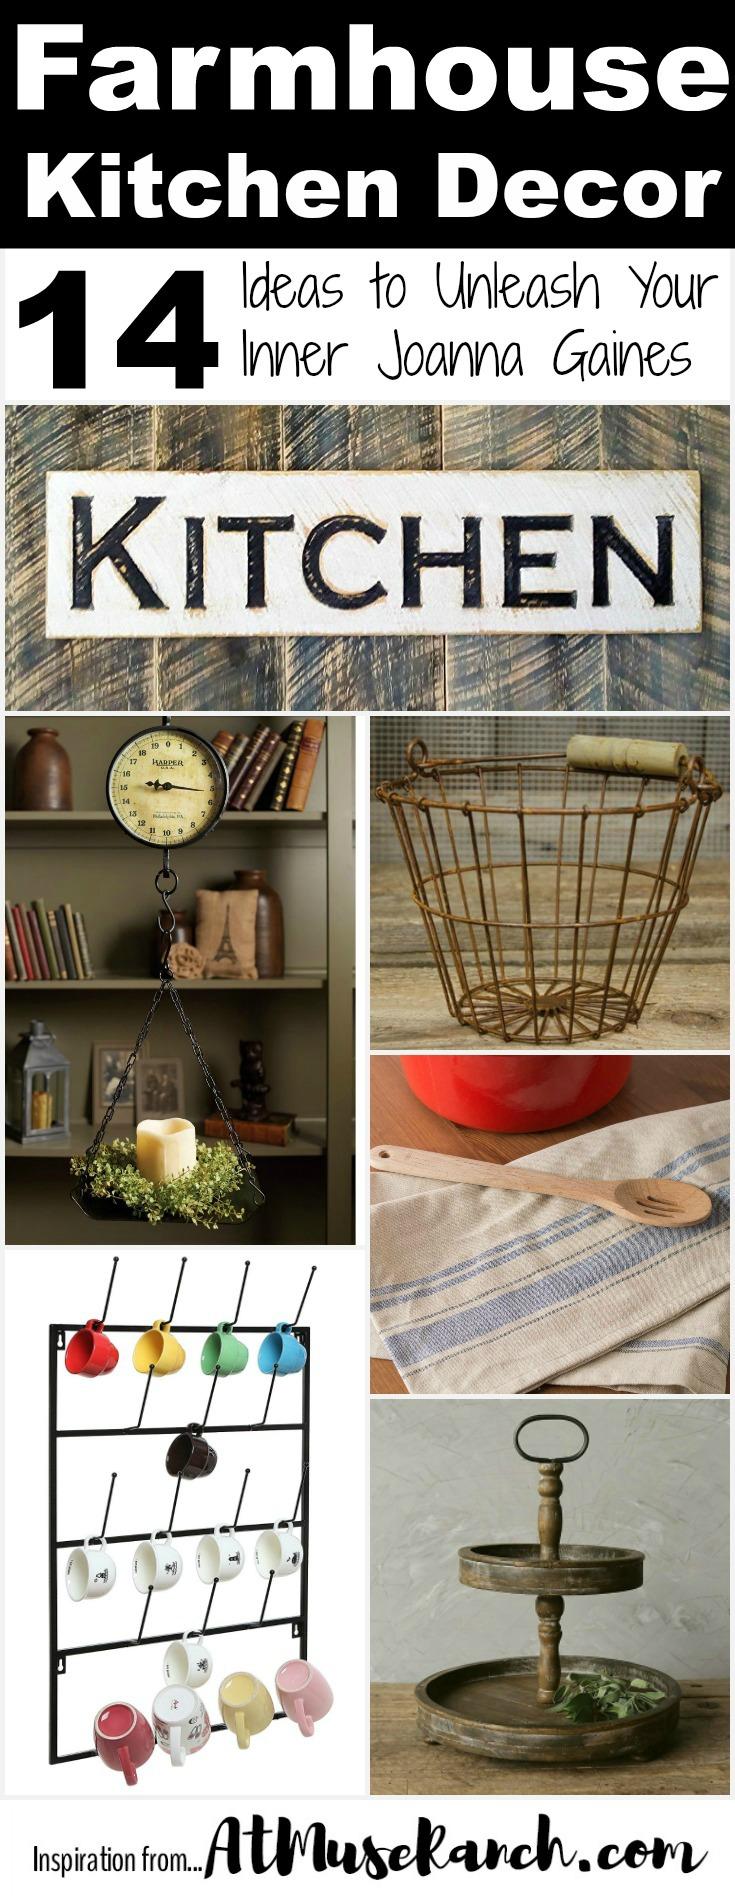 Farmhouse Kitchen Decor Just Like Joanna Gaines